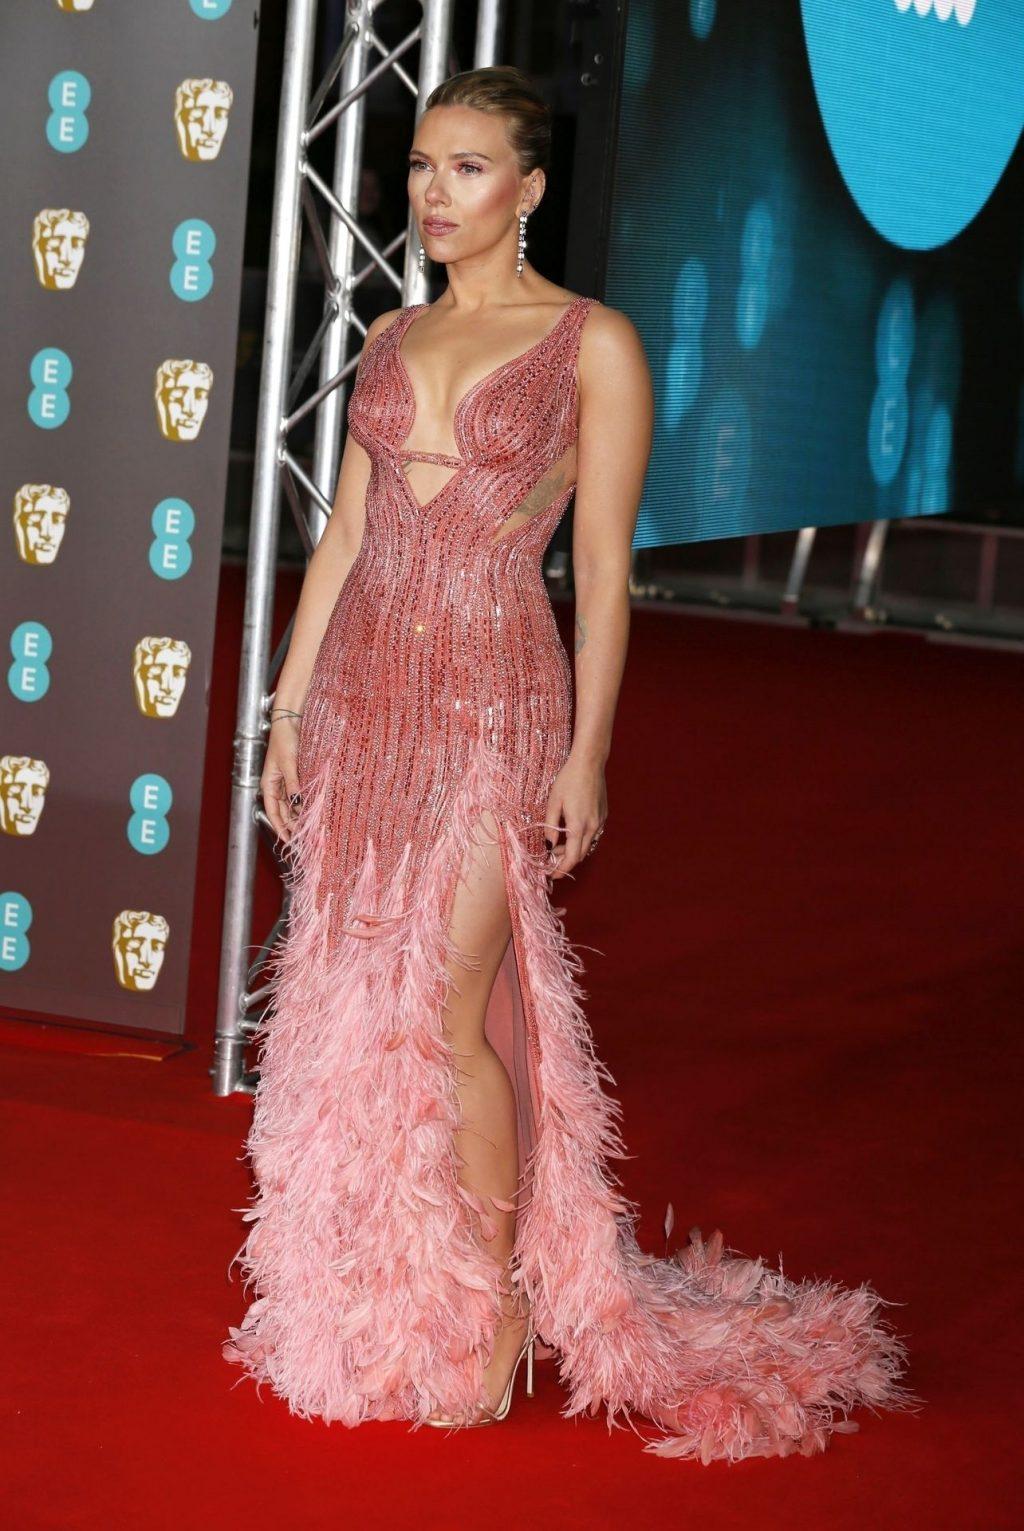 Scarlett Johansson Shines at The EE British Academy Film Awards (45 Photos)